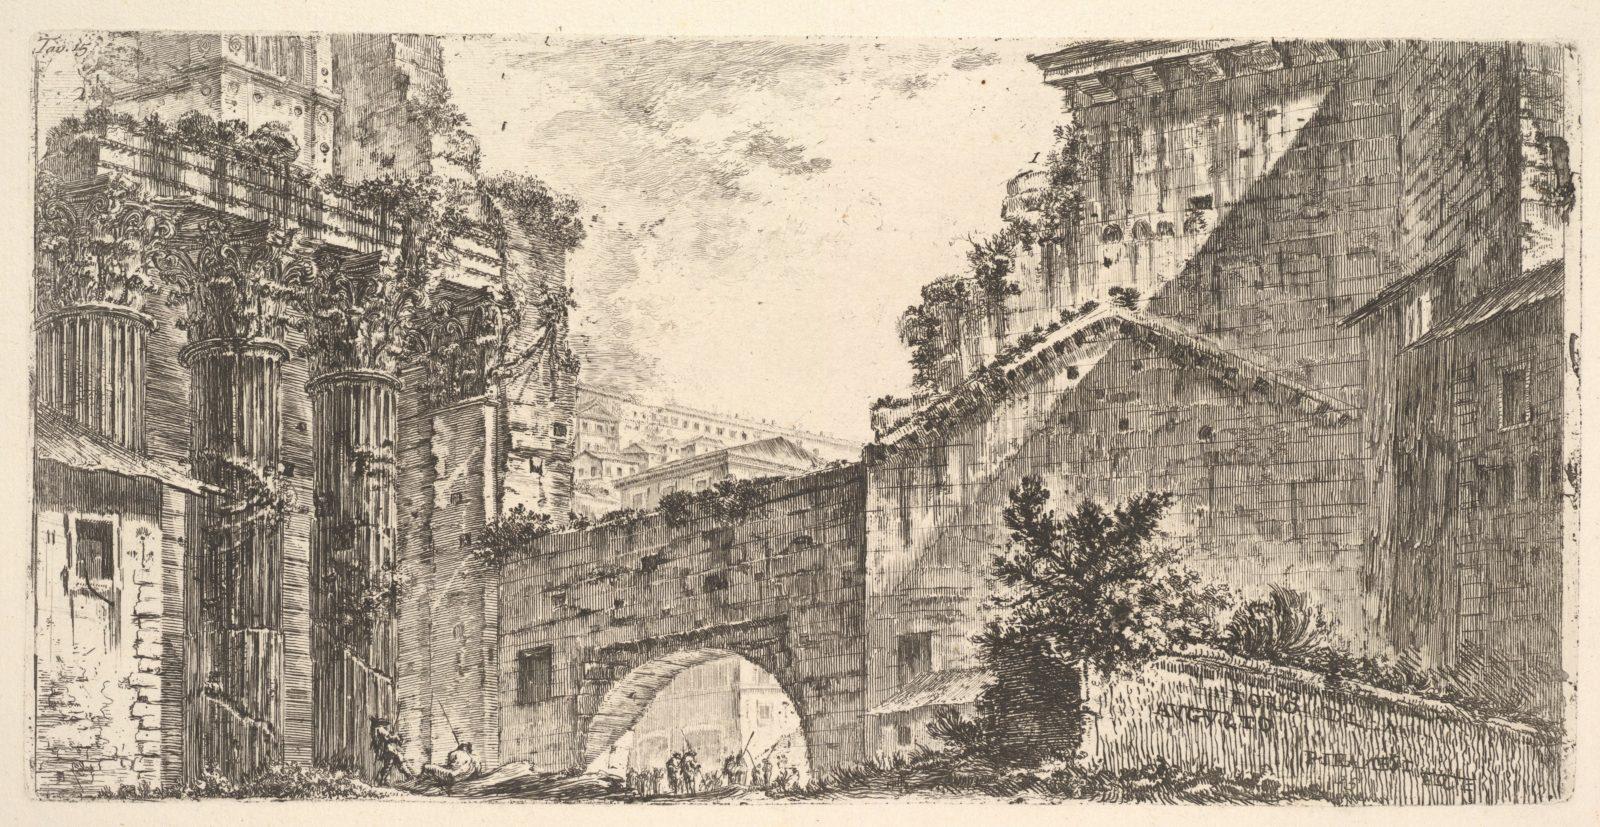 Plate 15: Forum of Augustus (Foro di Augusto)